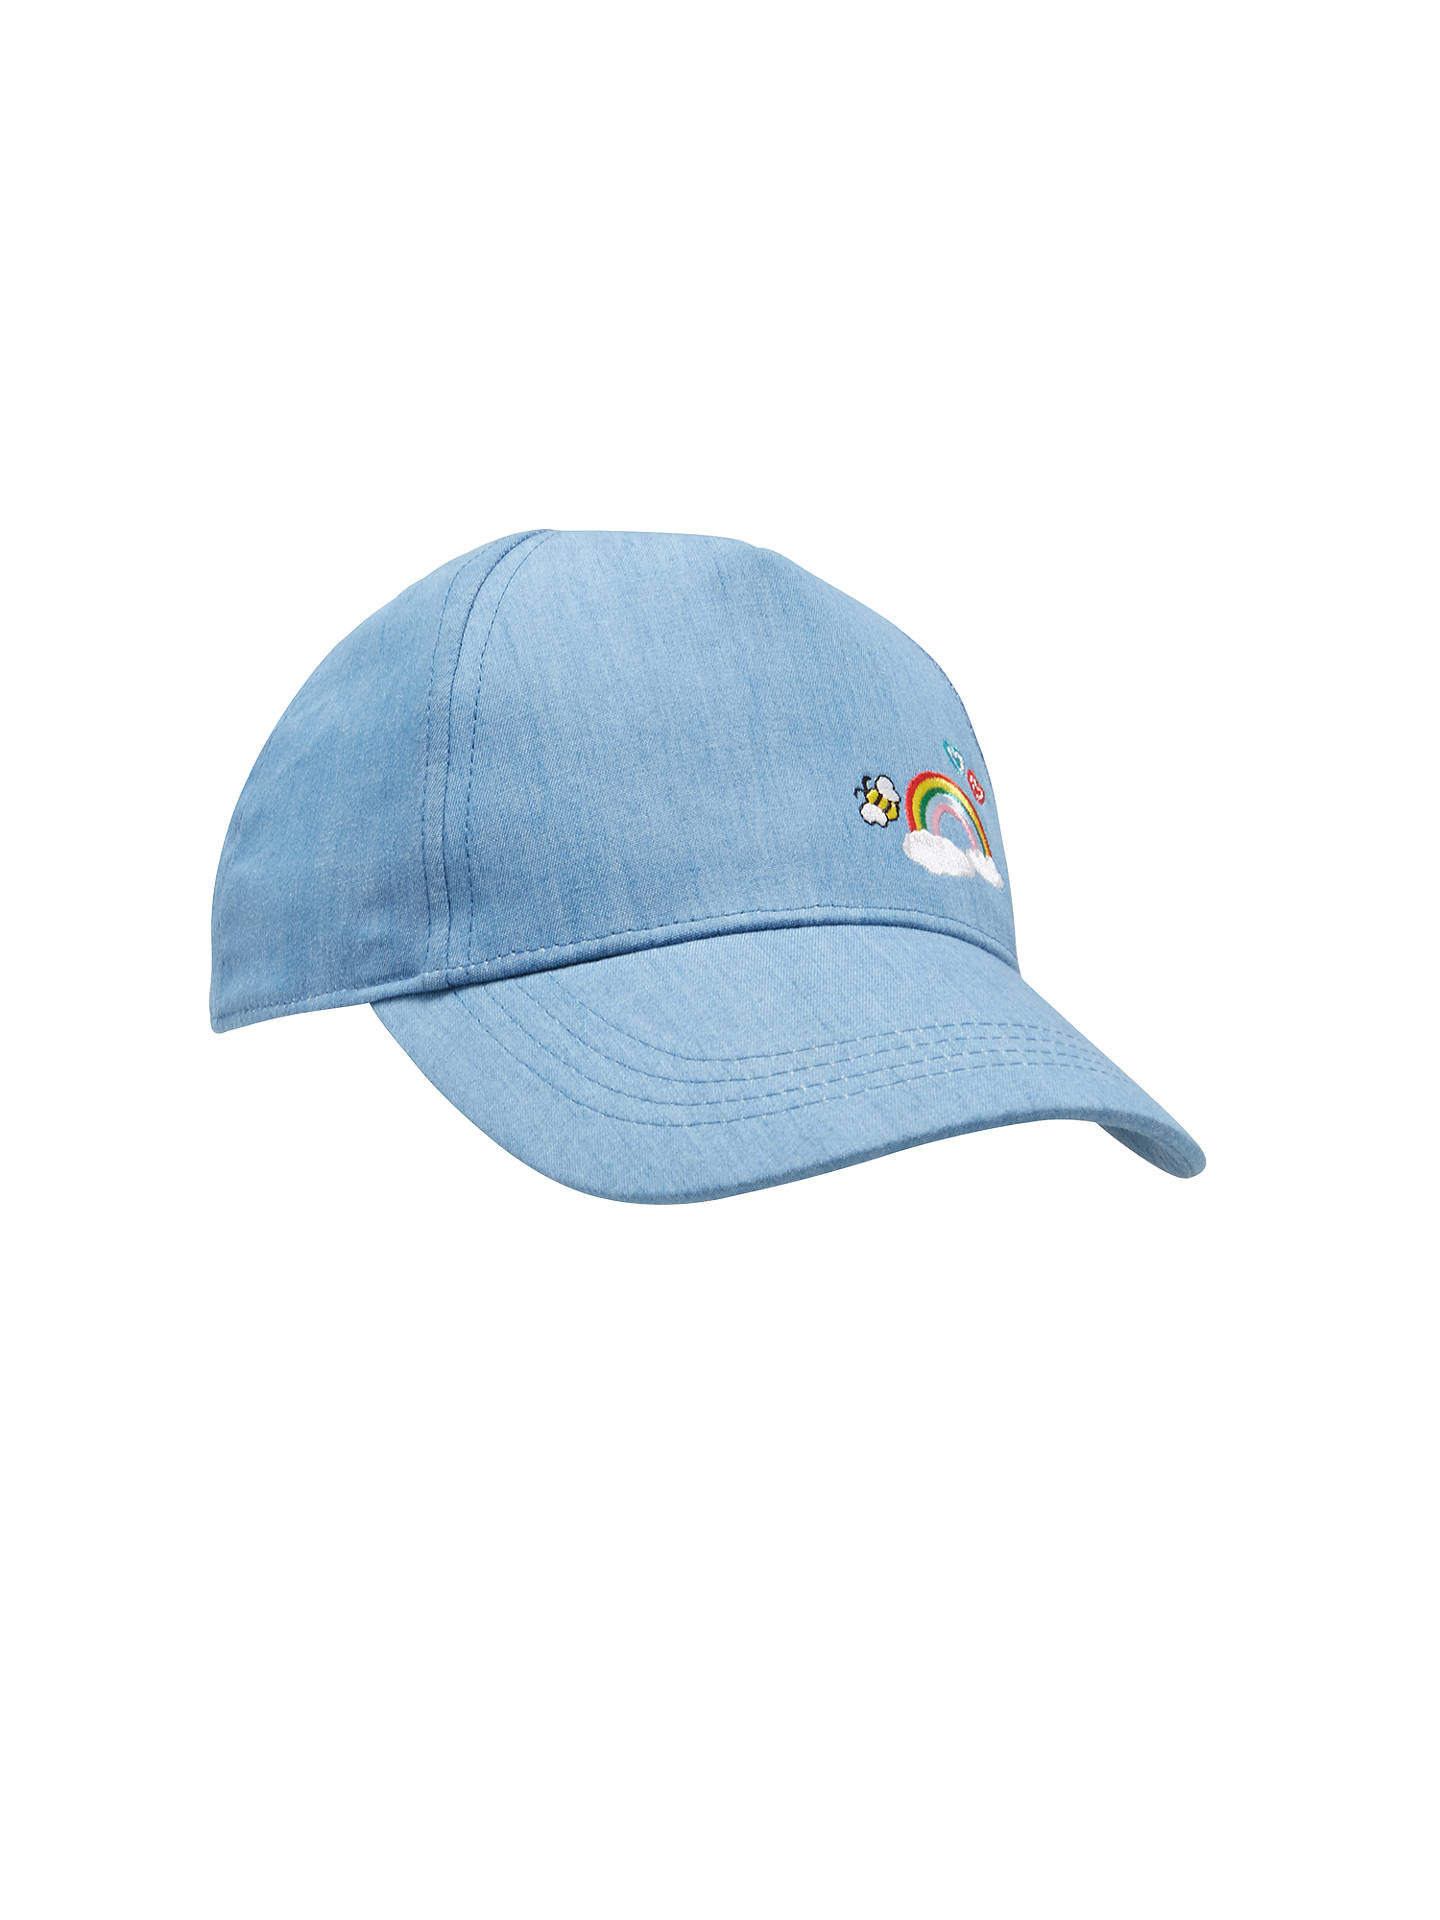 a8a3c539ec5 BuyJohn Lewis Children s Rainbow Chambray Baseball Cap